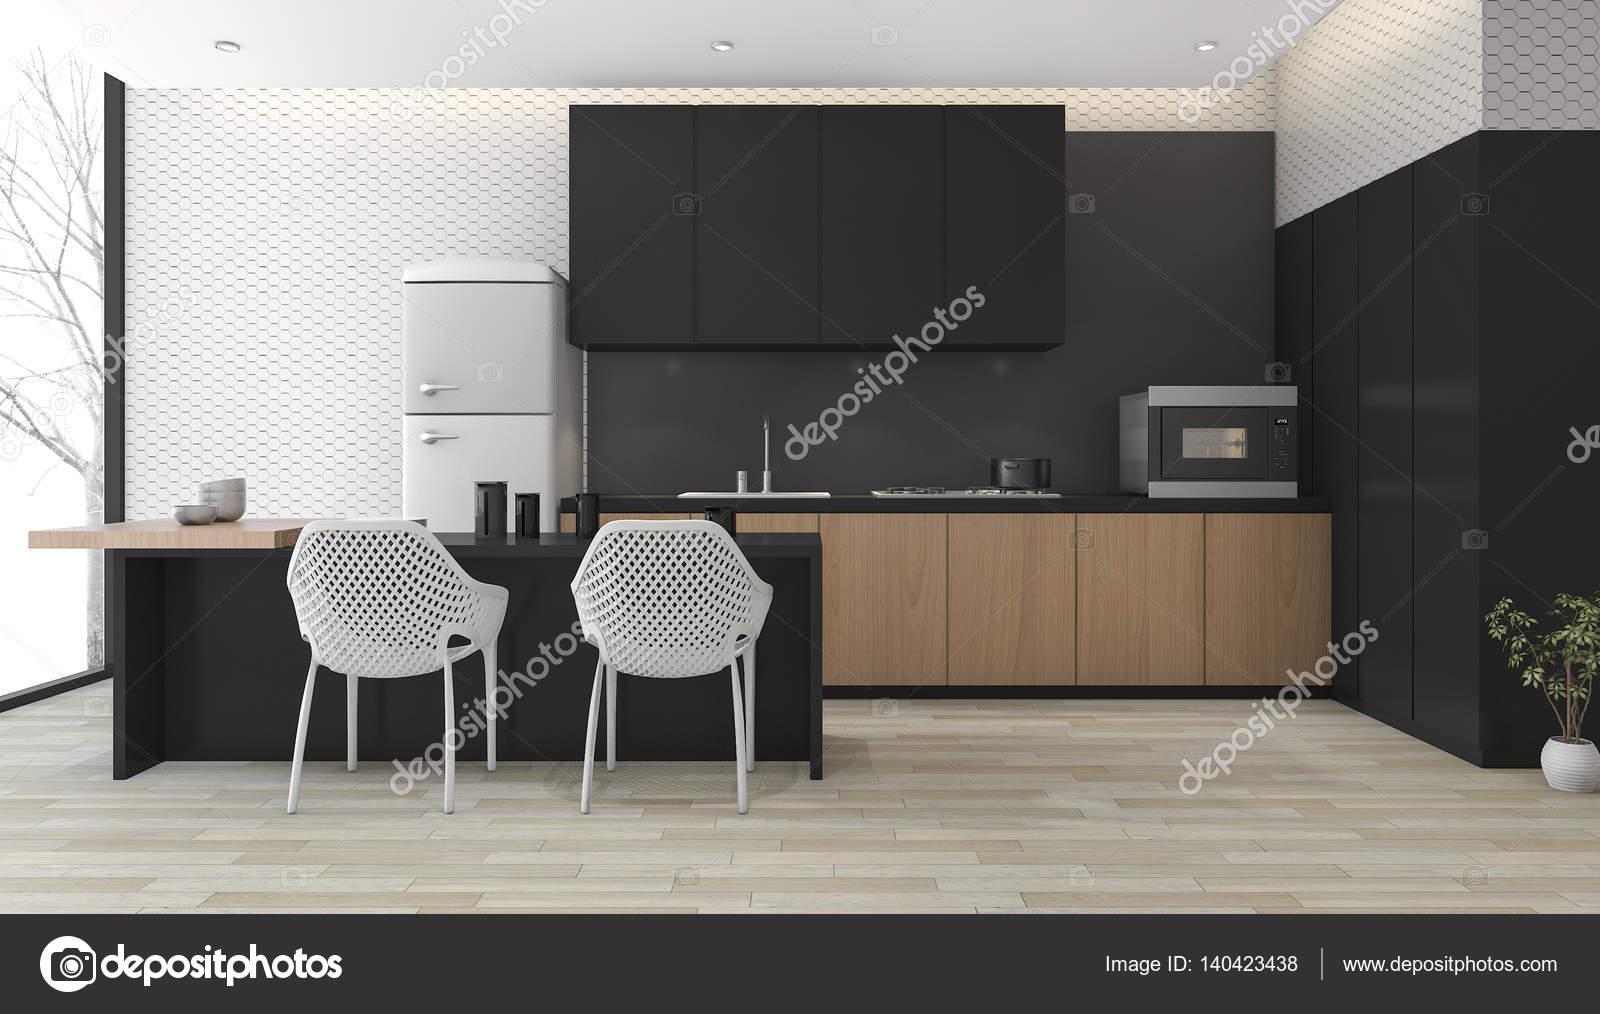 Strakke Zwarte Keuken : Moderne zwarte keuken